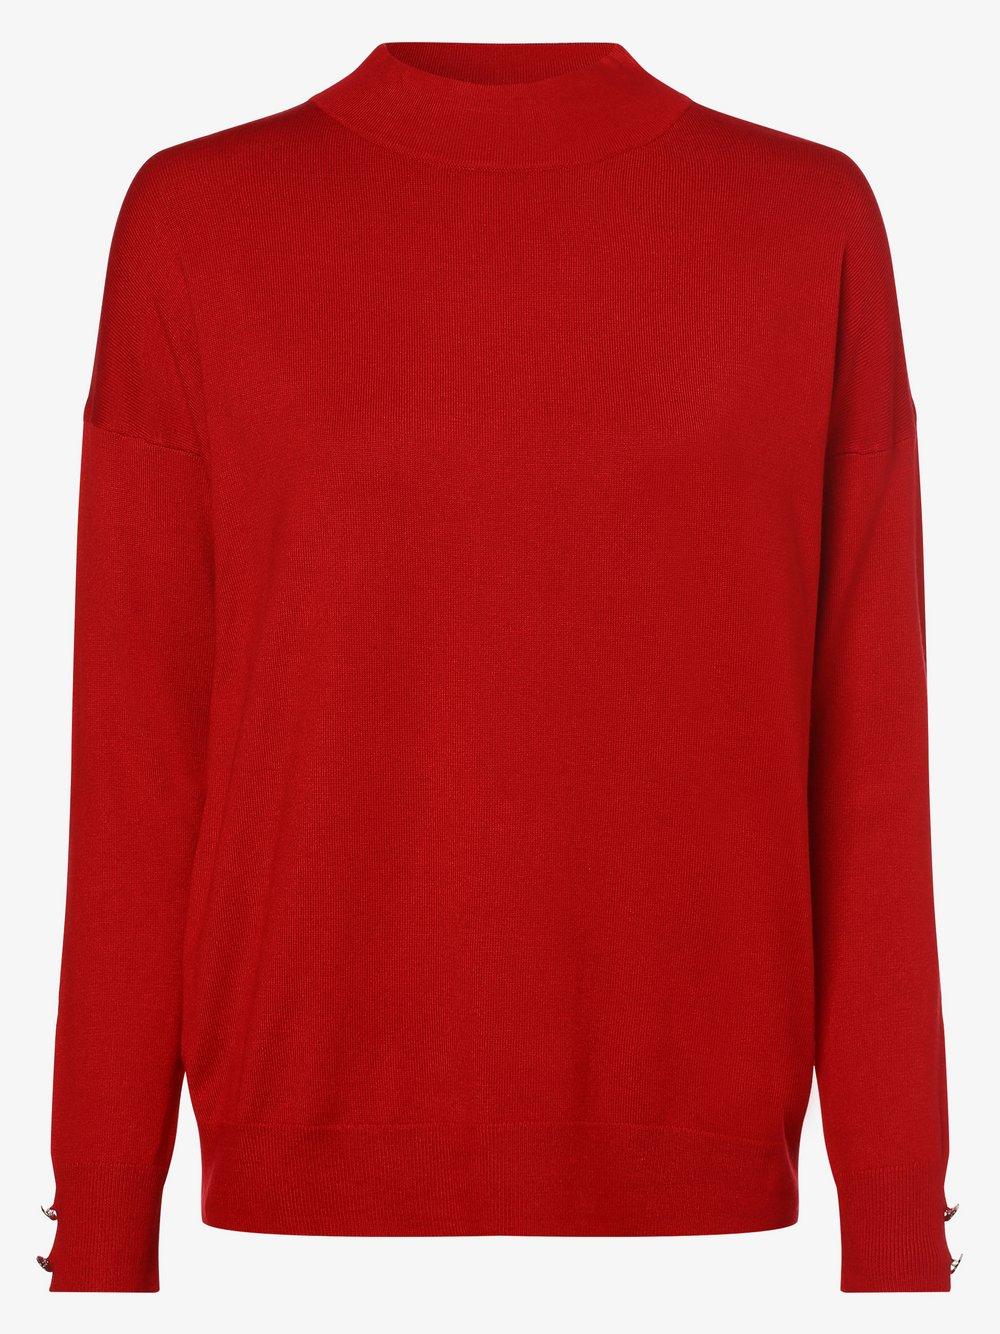 s.Oliver BLACK LABEL - Sweter damski, czerwony s.Oliver BLACK LABEL